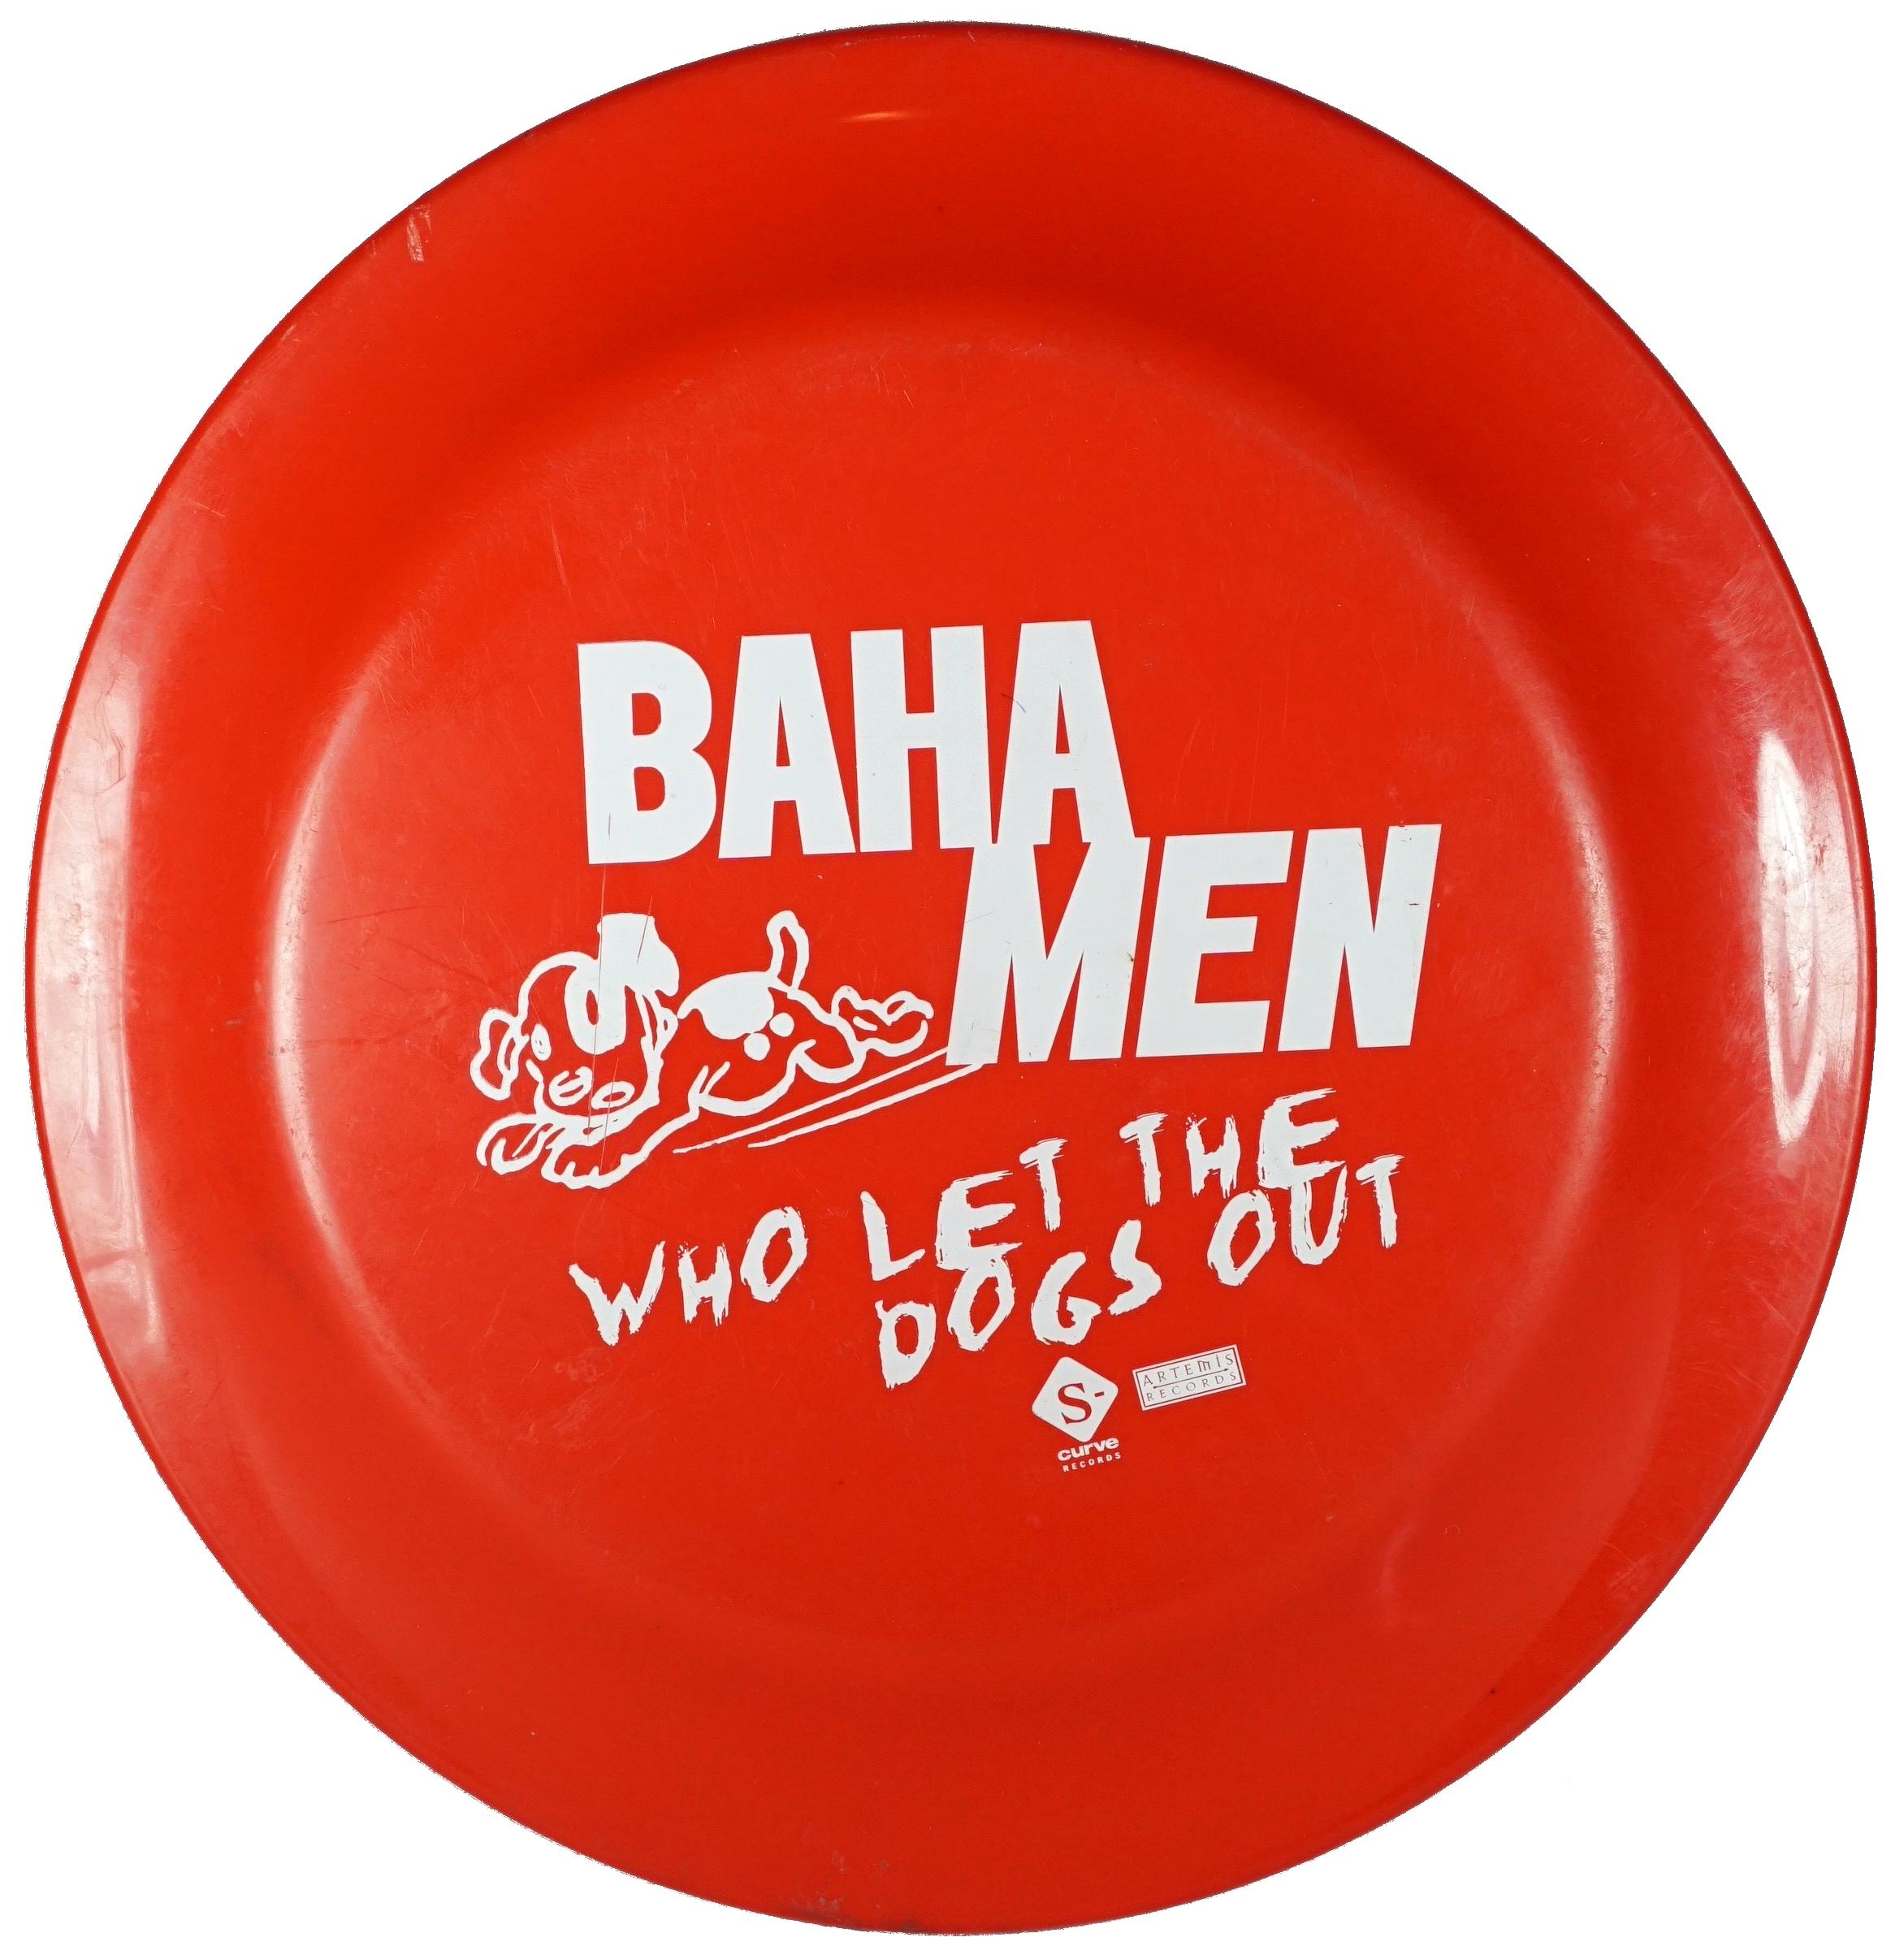 WLWLTDOO-TOY-2001-BAHA_MEN-FLYING_DISC.jpg